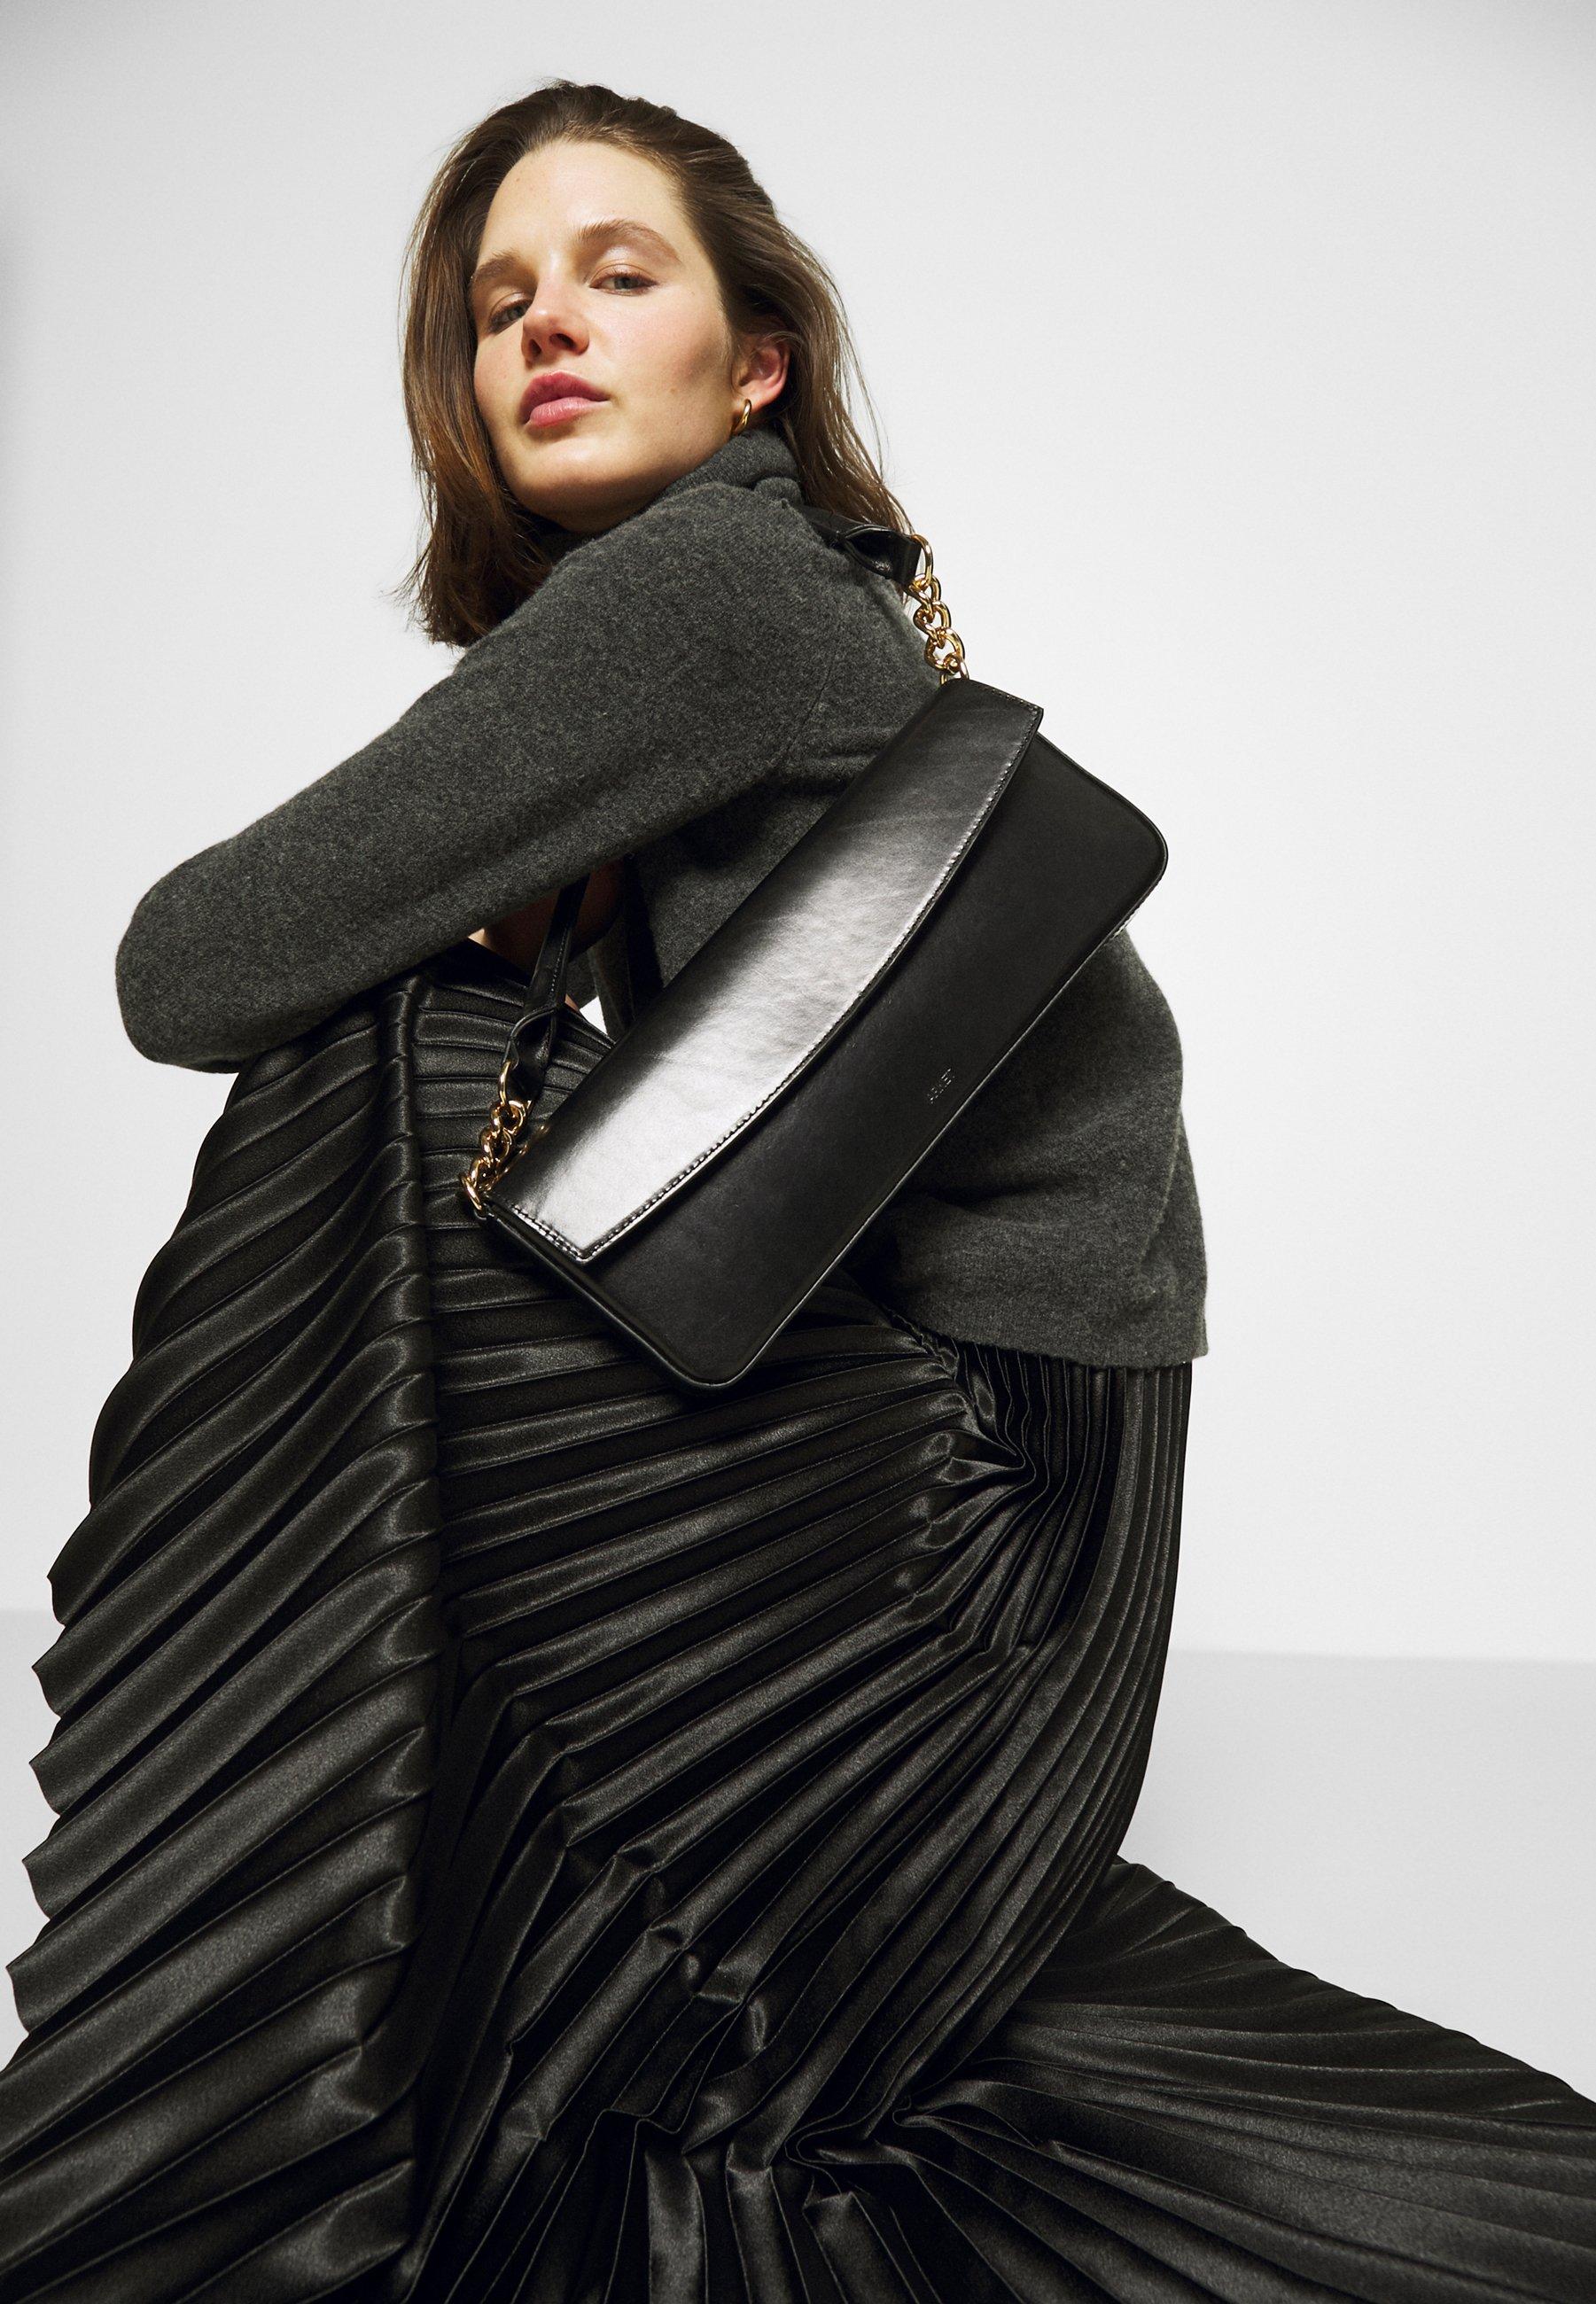 Femme RURY - Jupe plissée